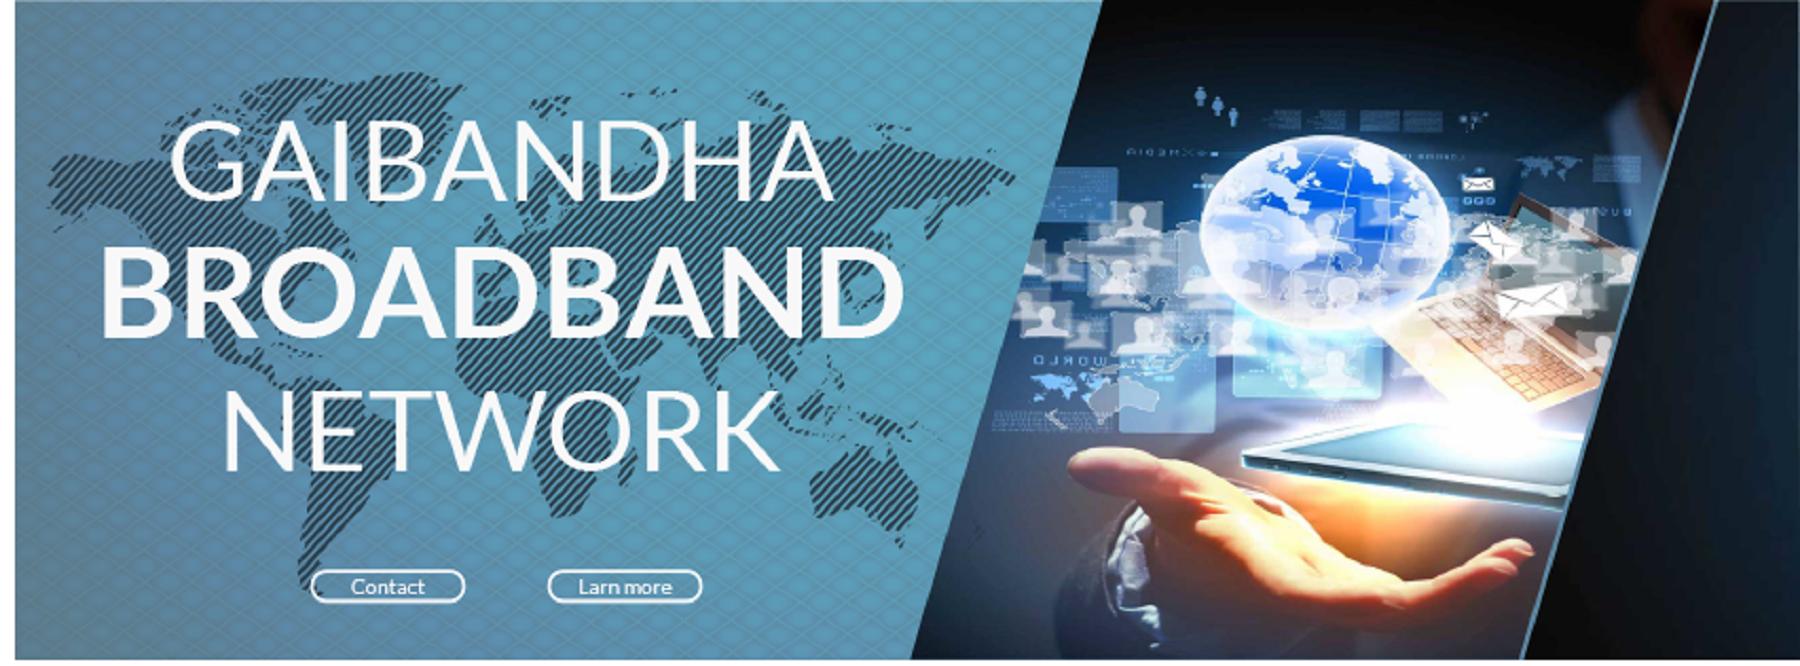 Structured Fiber Network Coverage